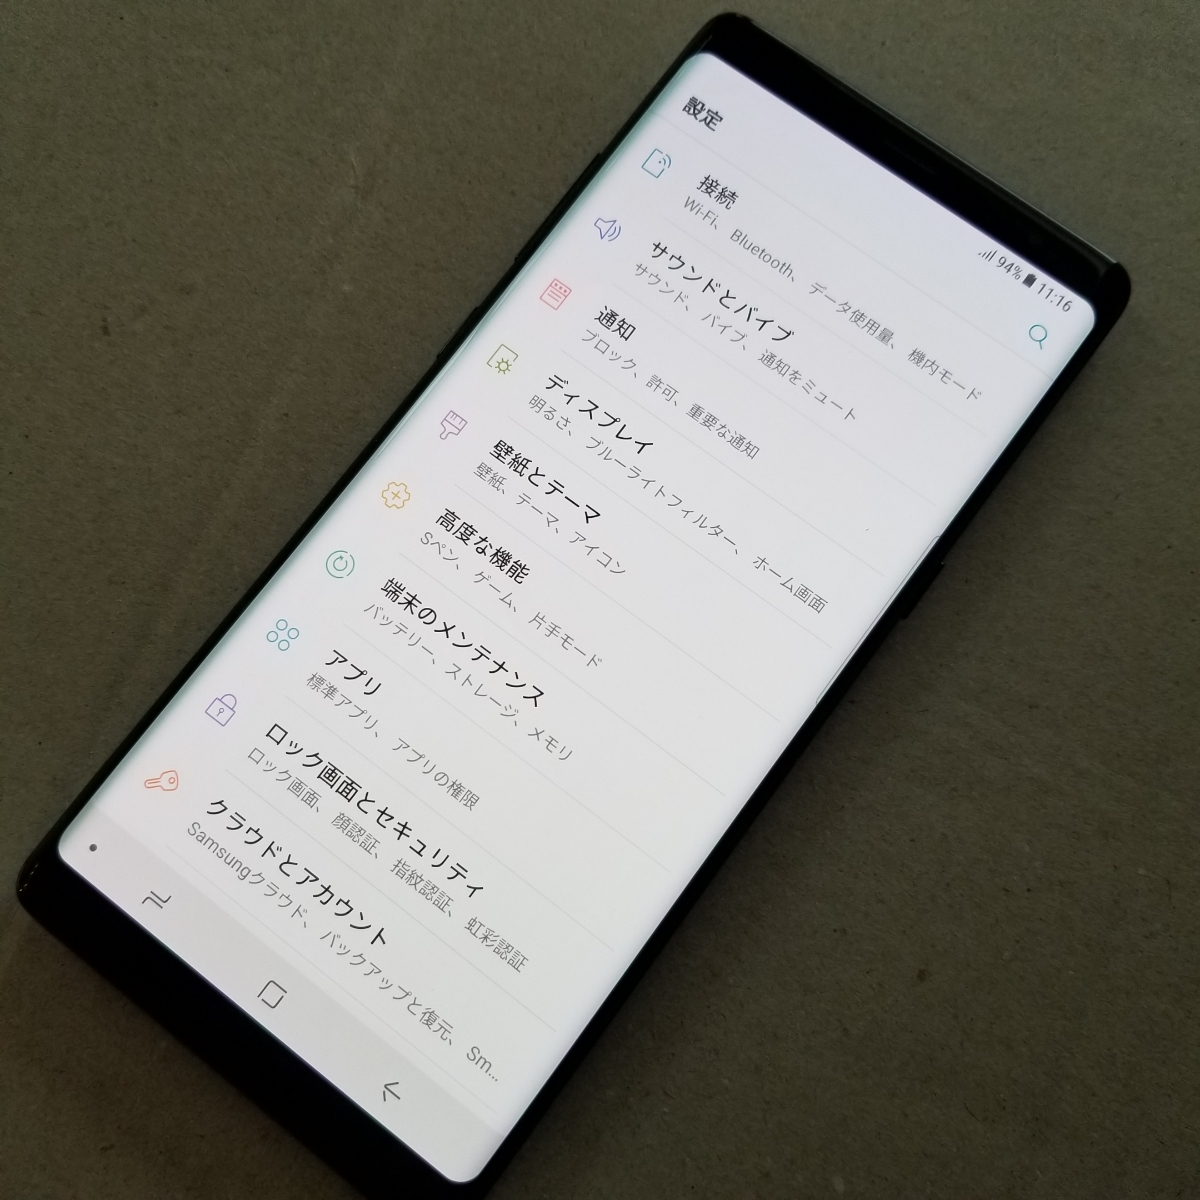 公式Simフリー 新品状態 Galaxy Note8 SM-N950F/DS Dual SIM 256GB 日本語対応 (ウ)_画像2